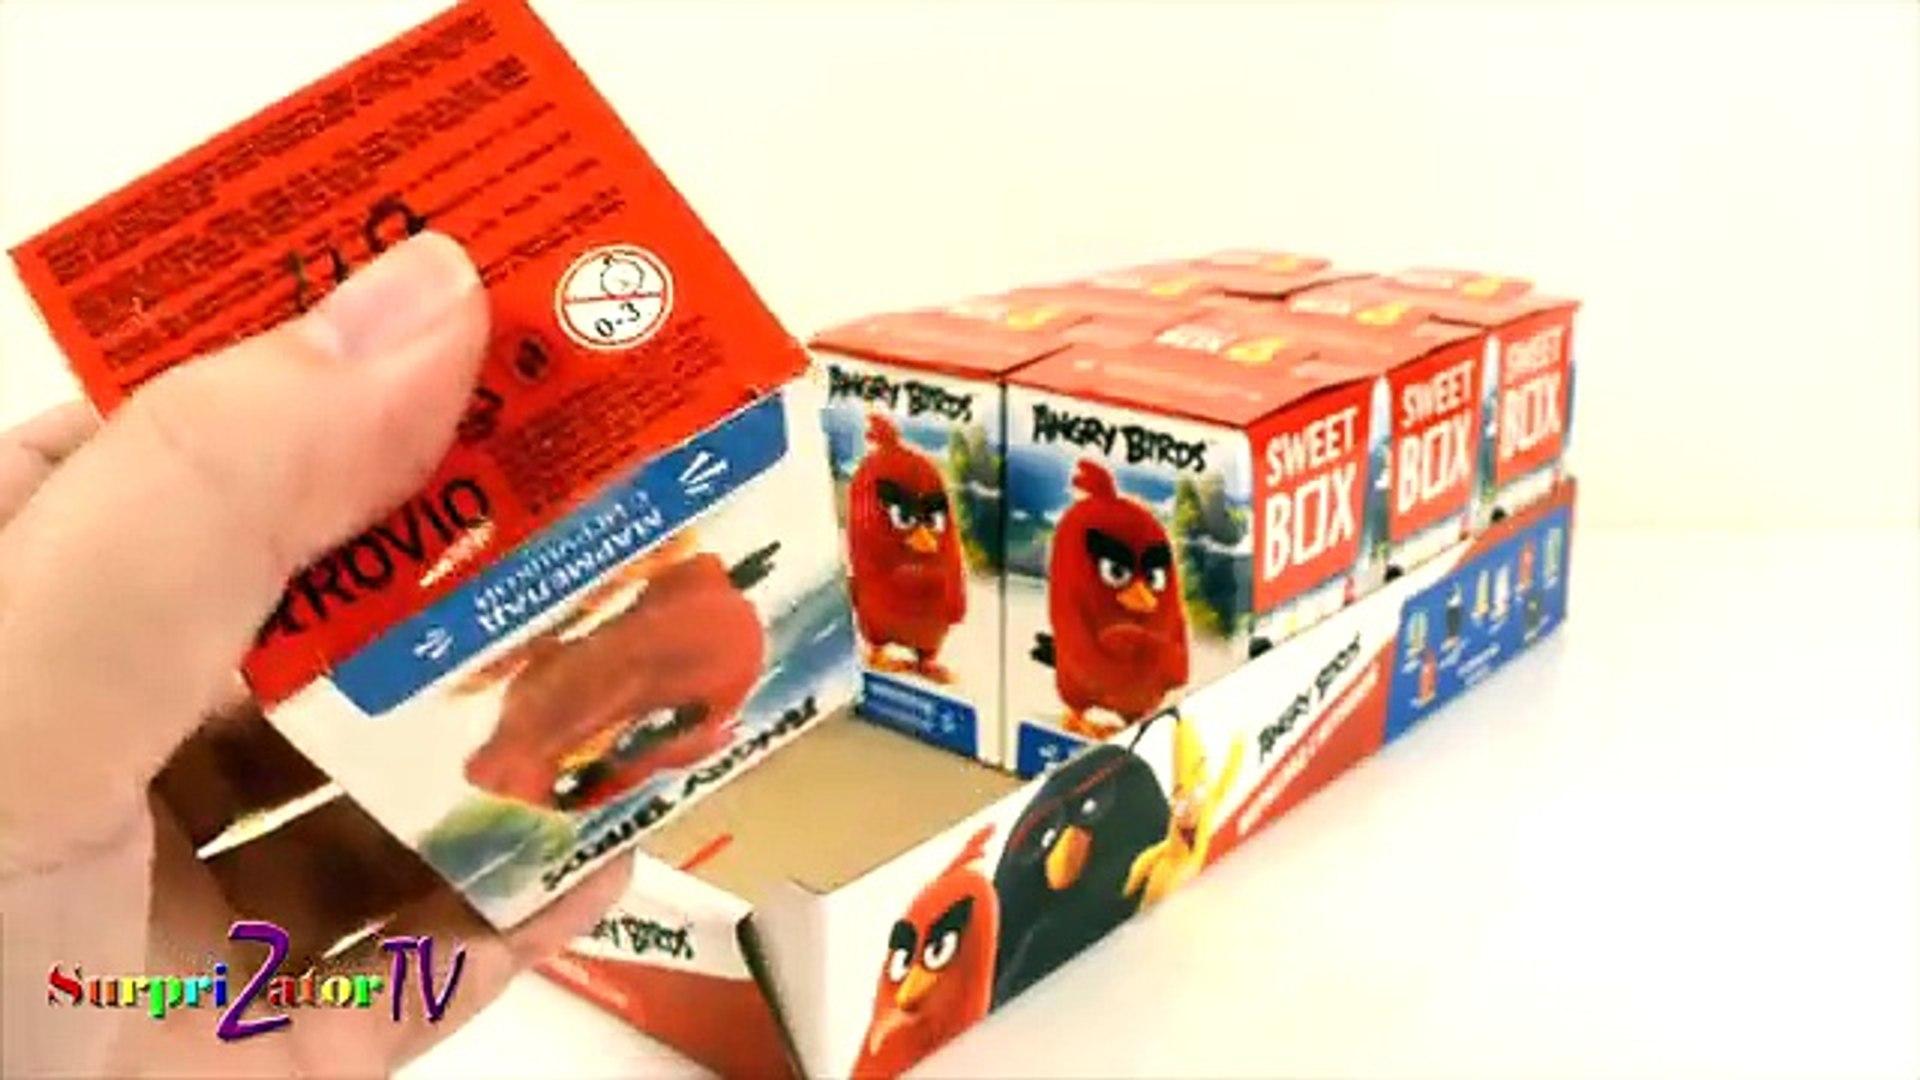 Энгри Бёрдс В Кино СВИТ БОКС Коробочки Сюрпризы ANGRY BIRDS MOVIE Blind Box SWEET BOX Весь Блок